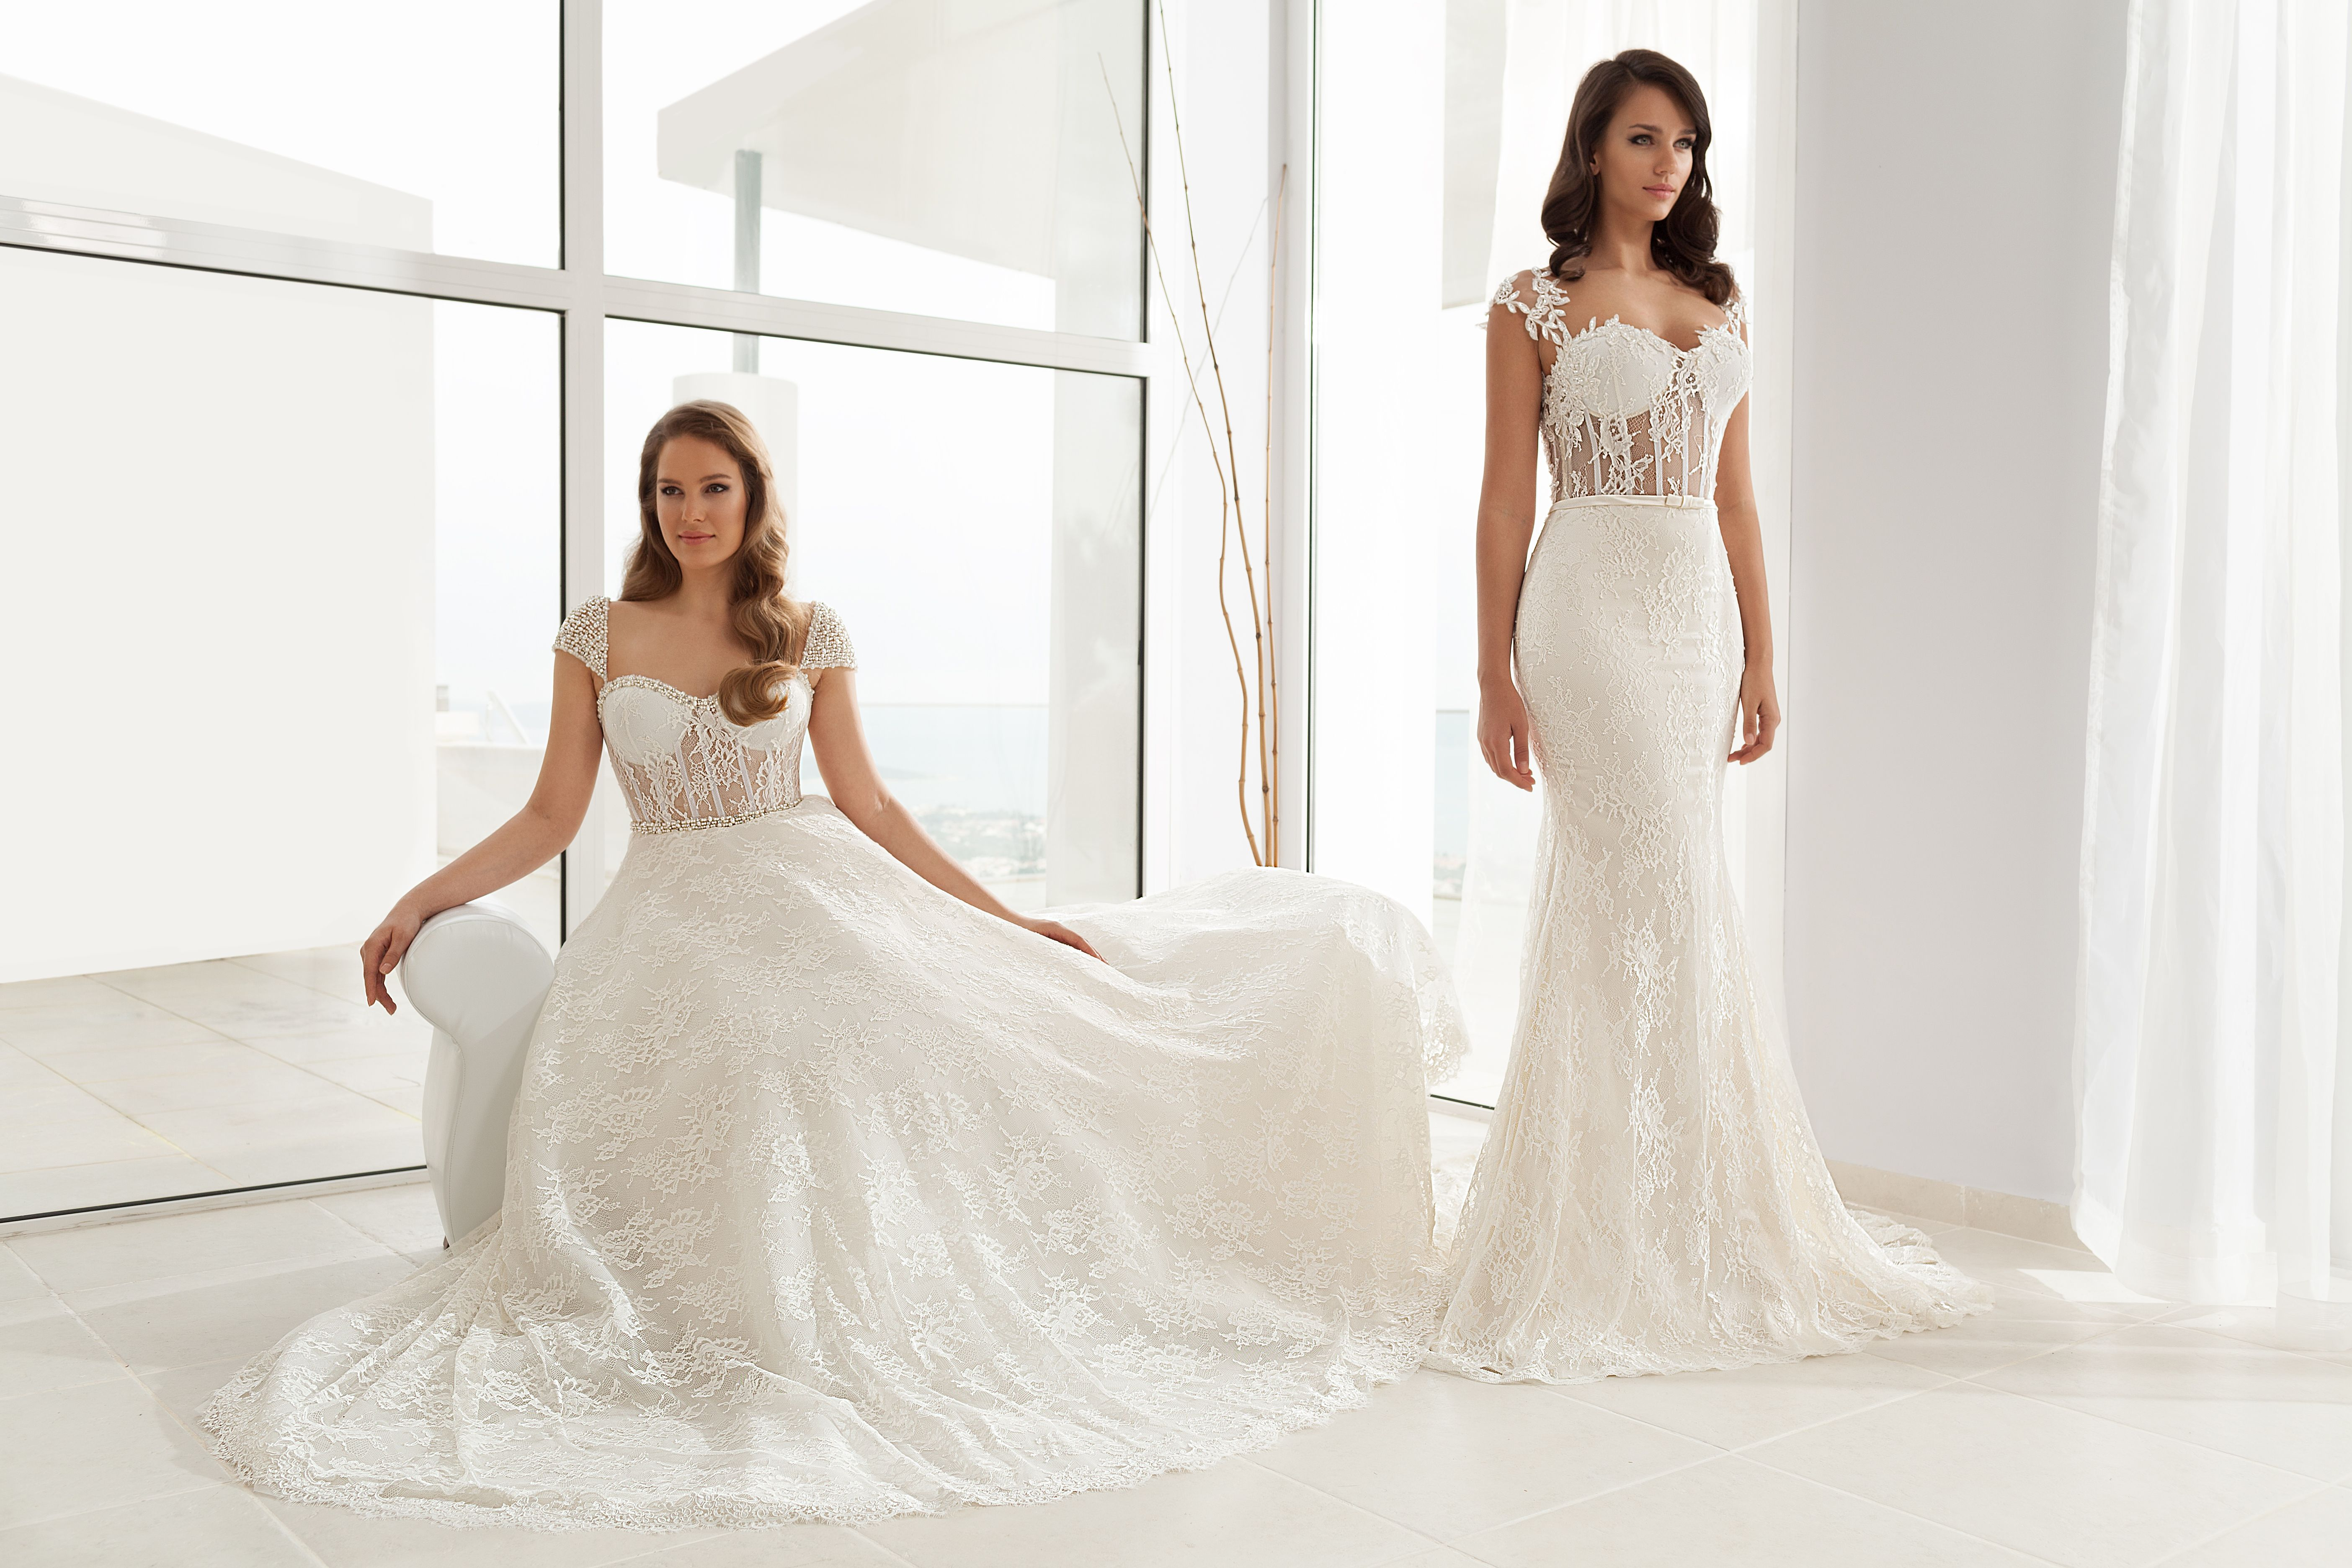 Wholesale Wedding Gowns In Usa: Wedding Dresses Collection, Wedding Dress Designs, Nova